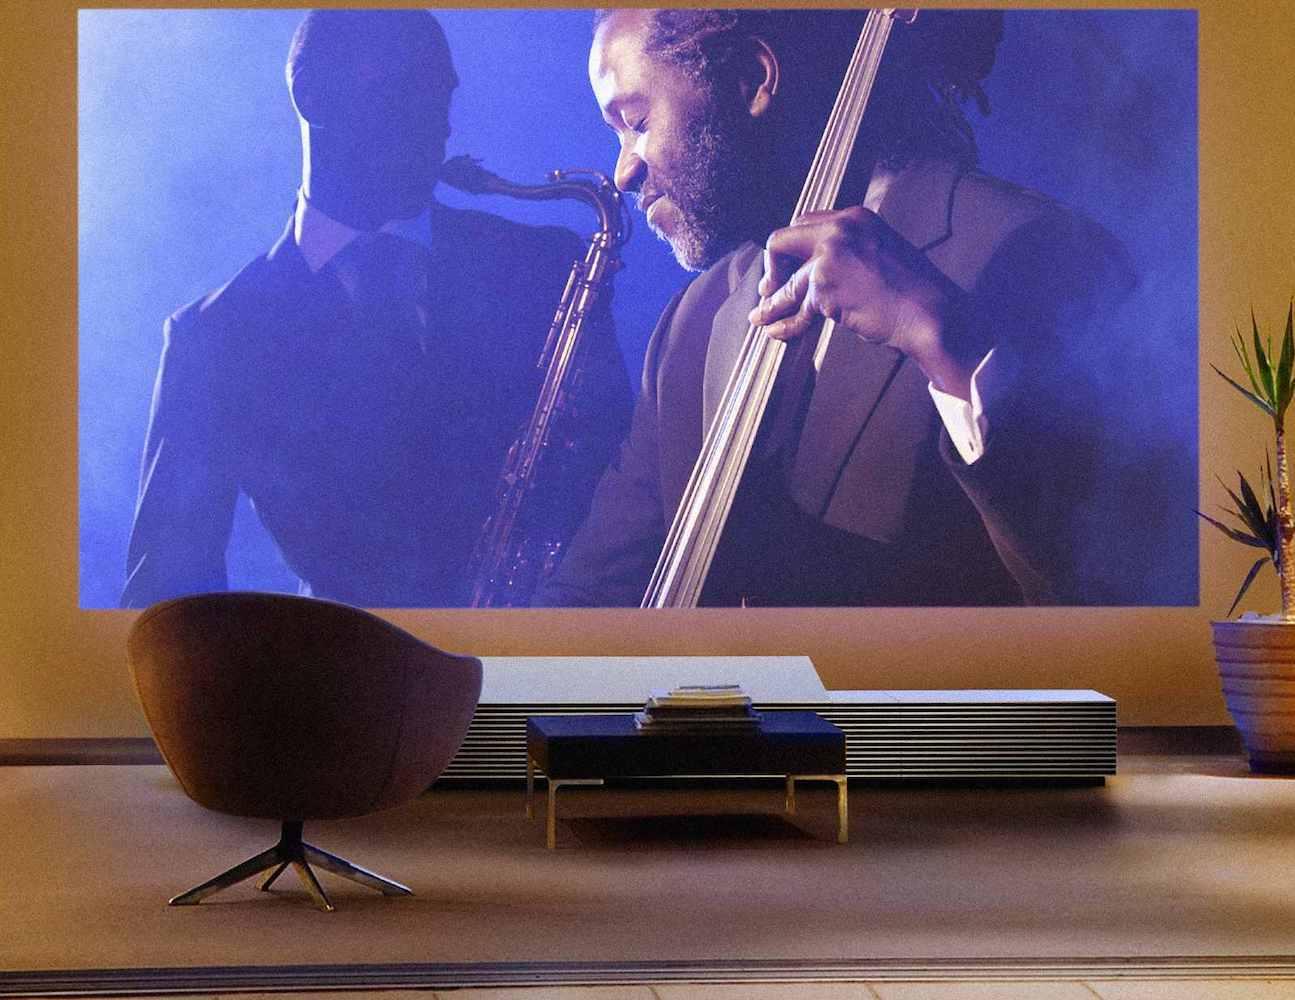 Sony Short Throw 4K Projector